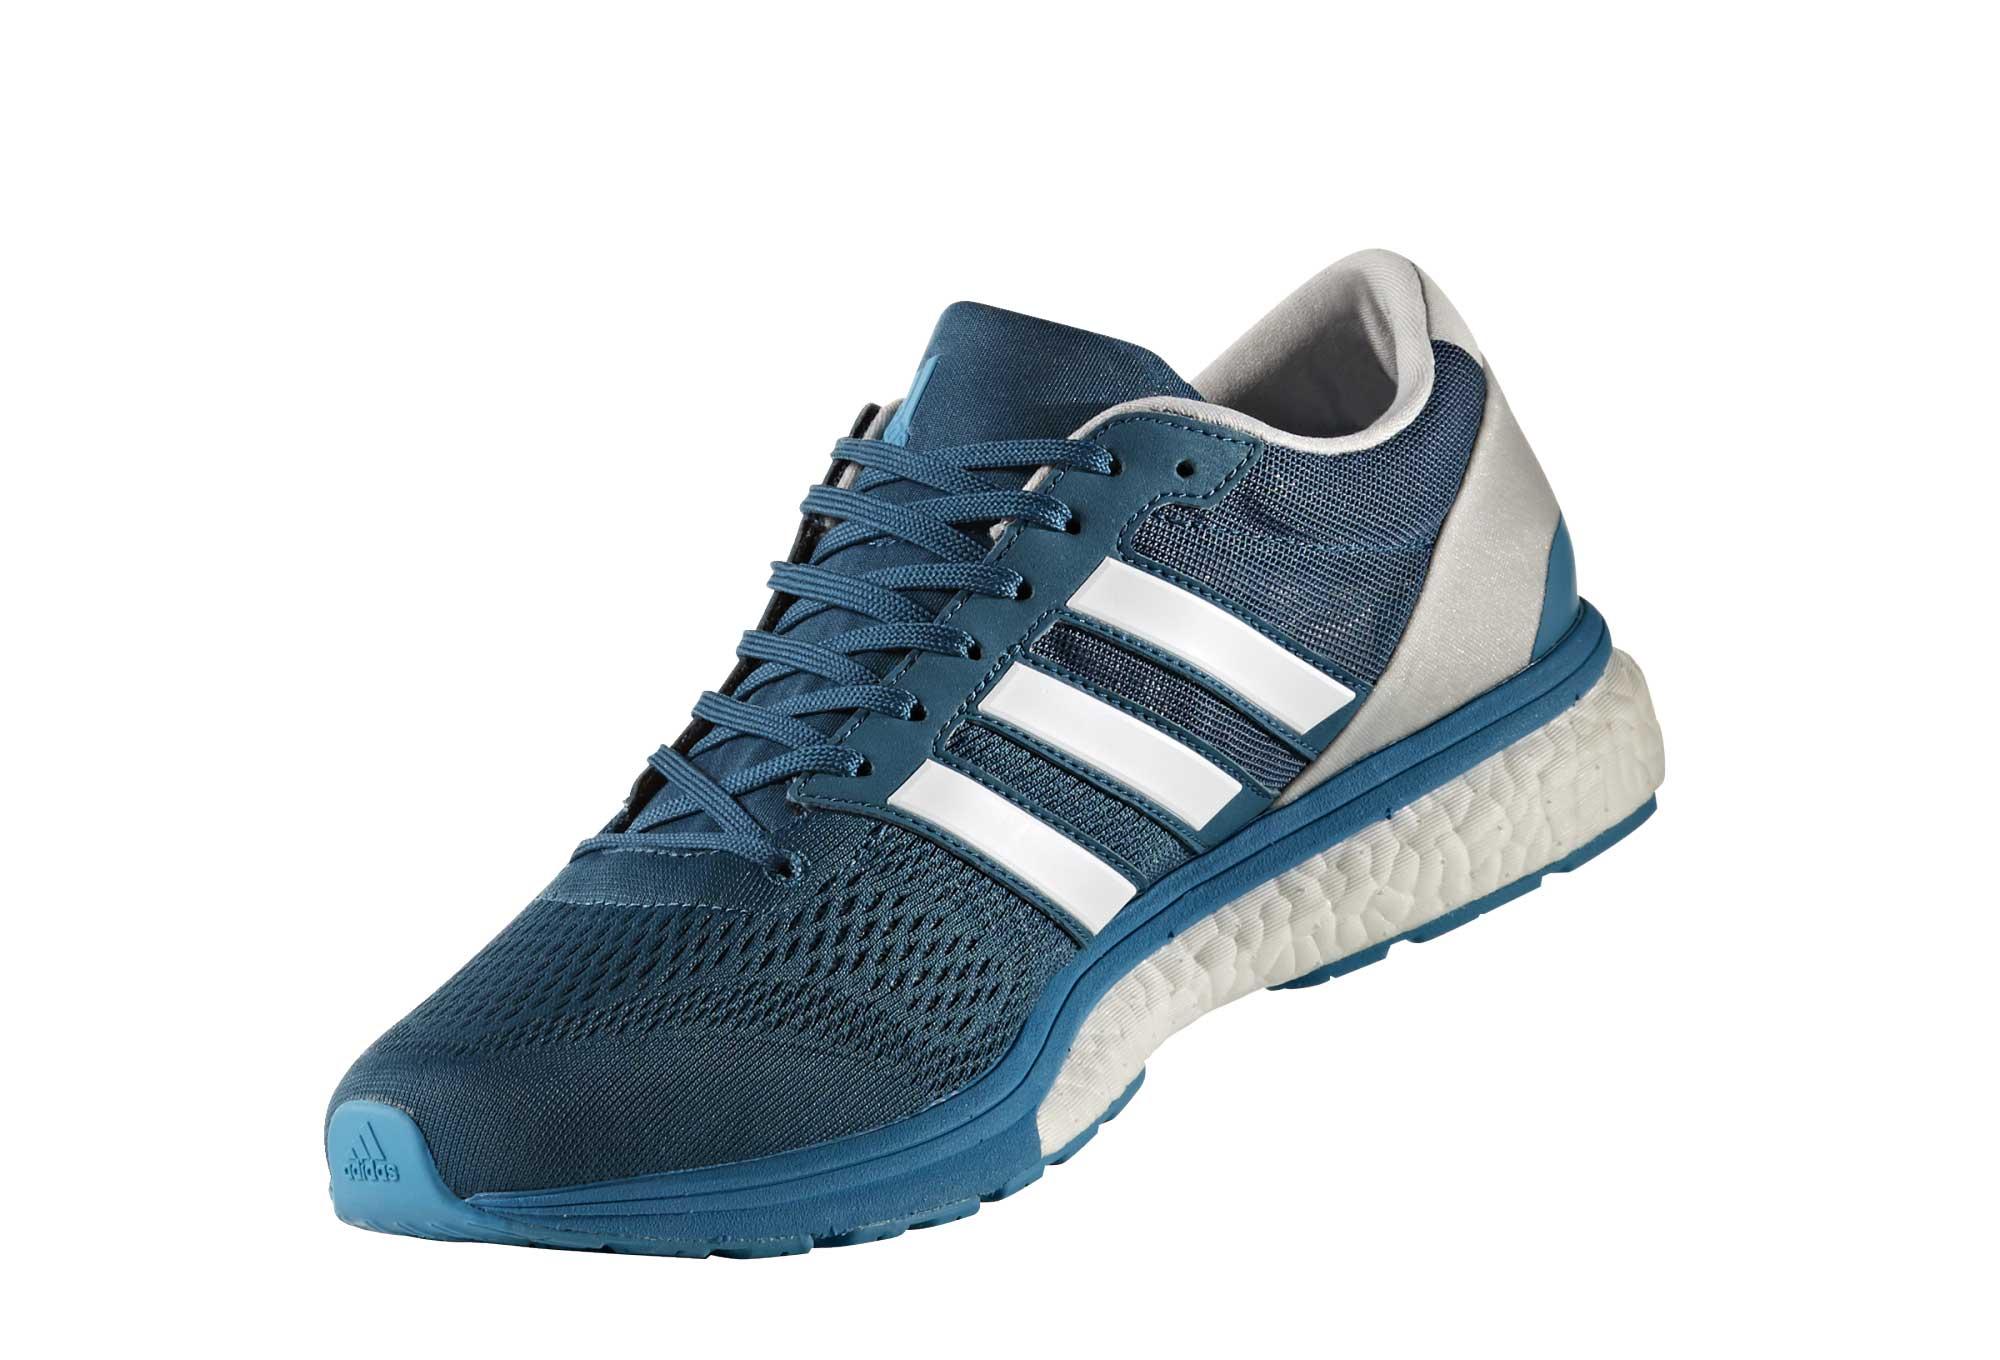 7028ff3693f Chaussures de Running adidas running Adizero Boston 6 Bleu   Gris ...